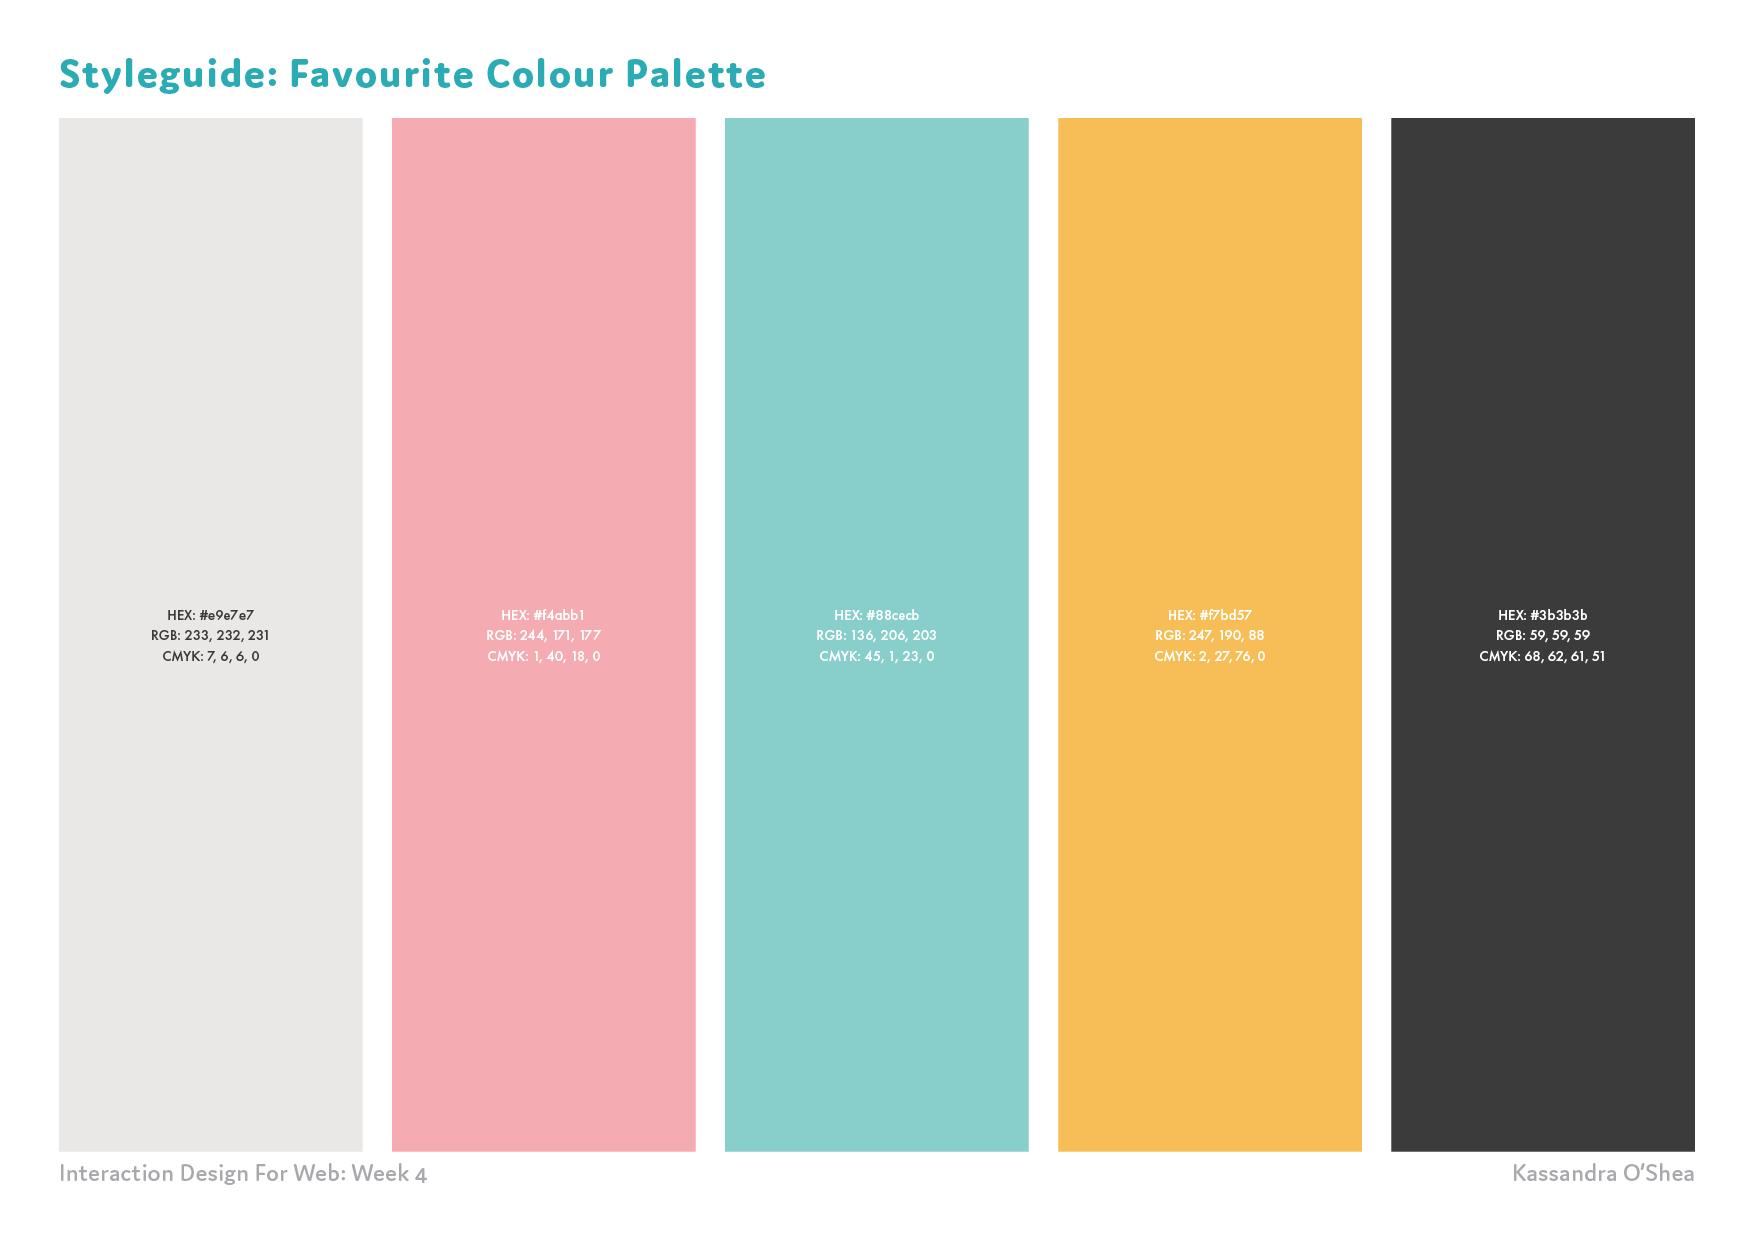 Styleguide: Favourite Colour Palette